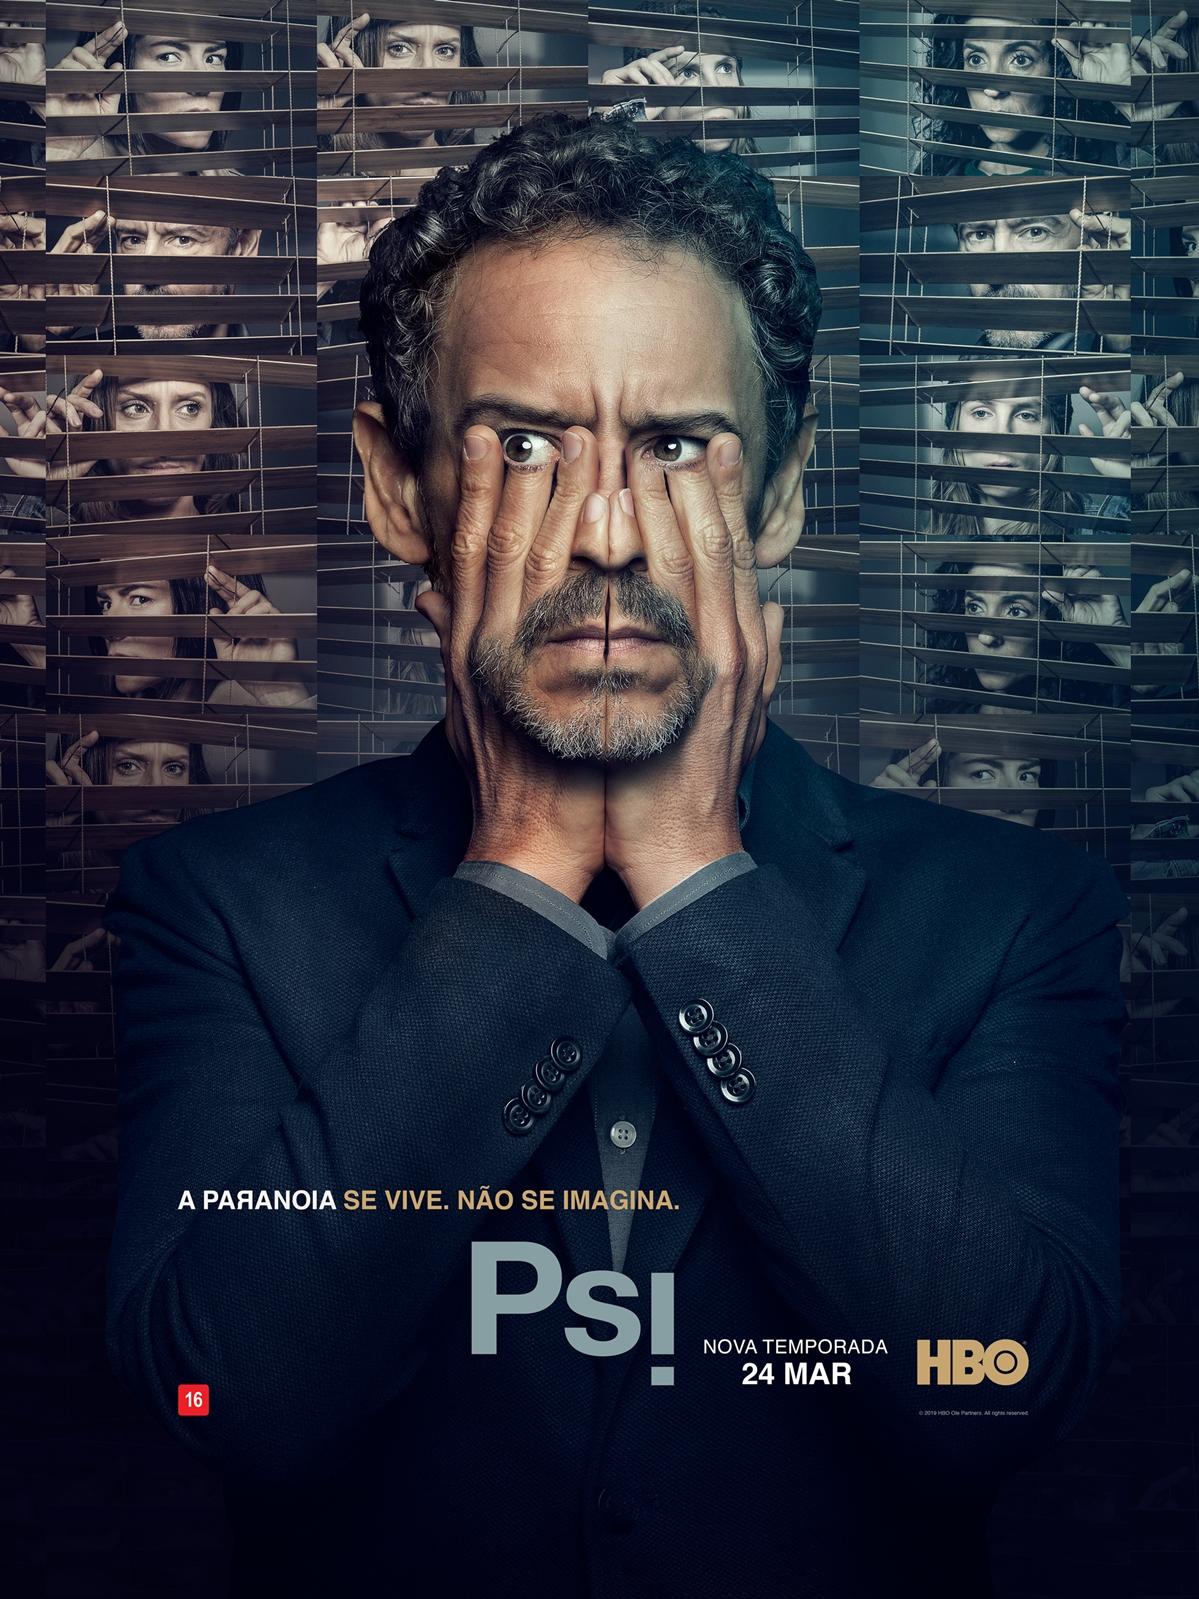 Psi (TV Series 2014– ) - IMDb